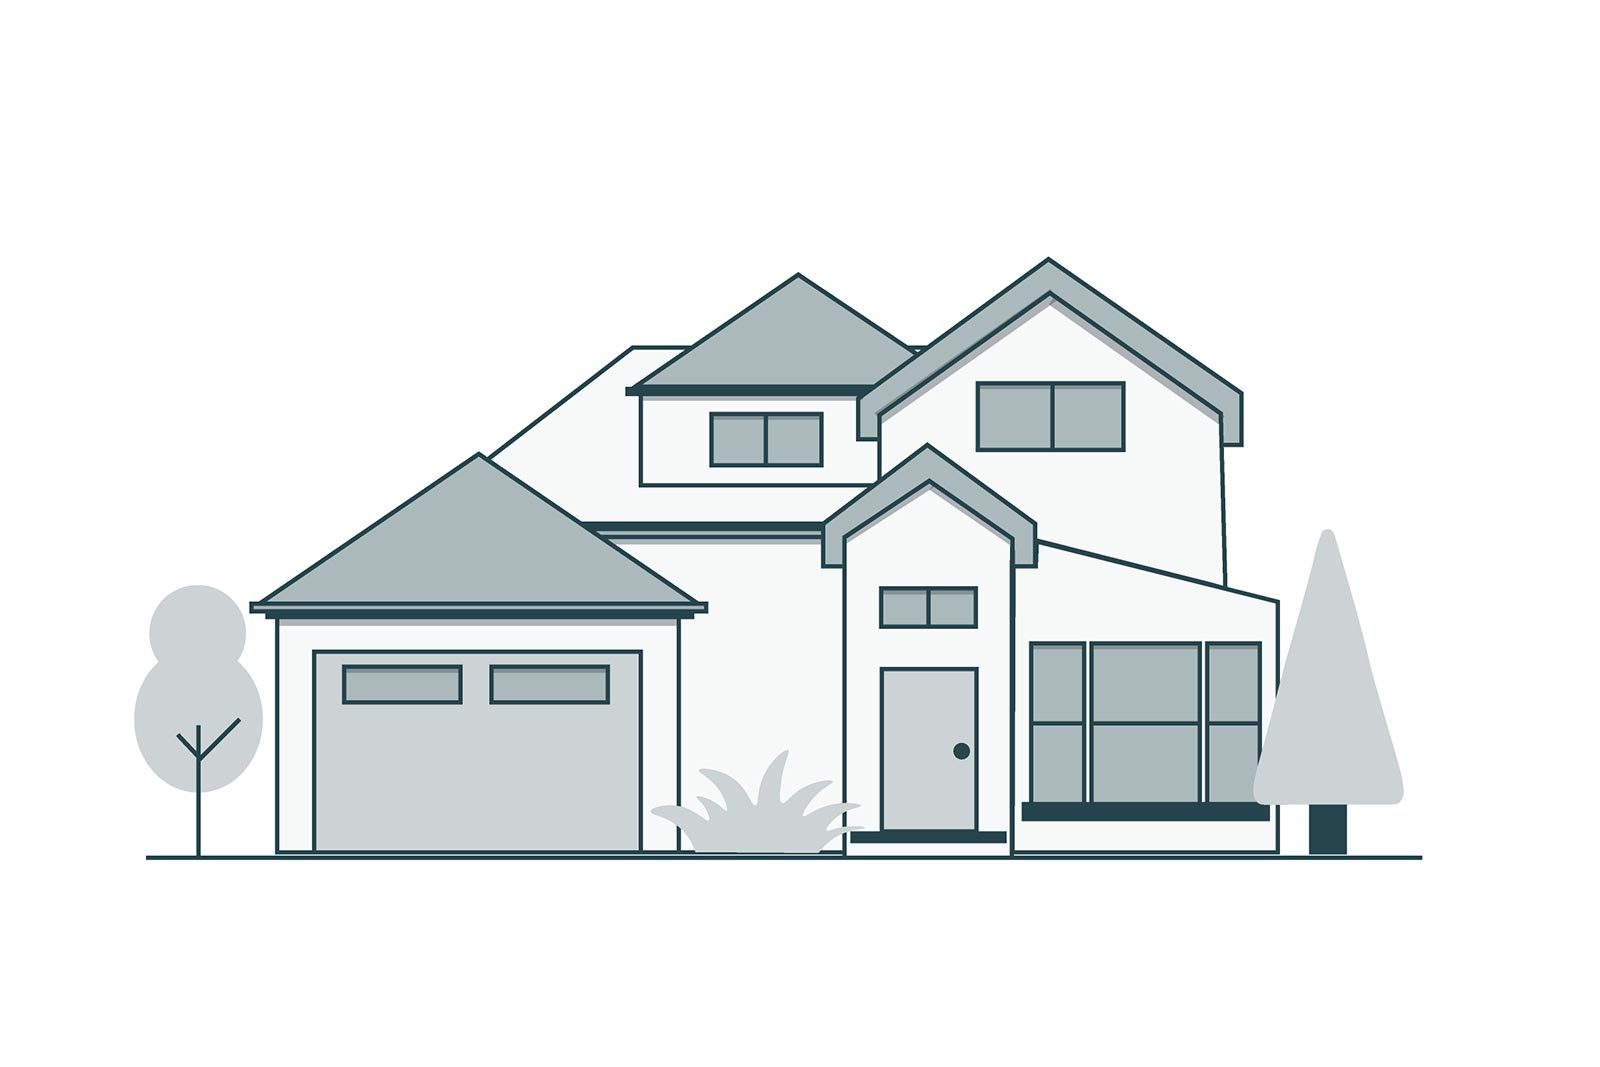 226 Morse St San Francisco, CA 94112